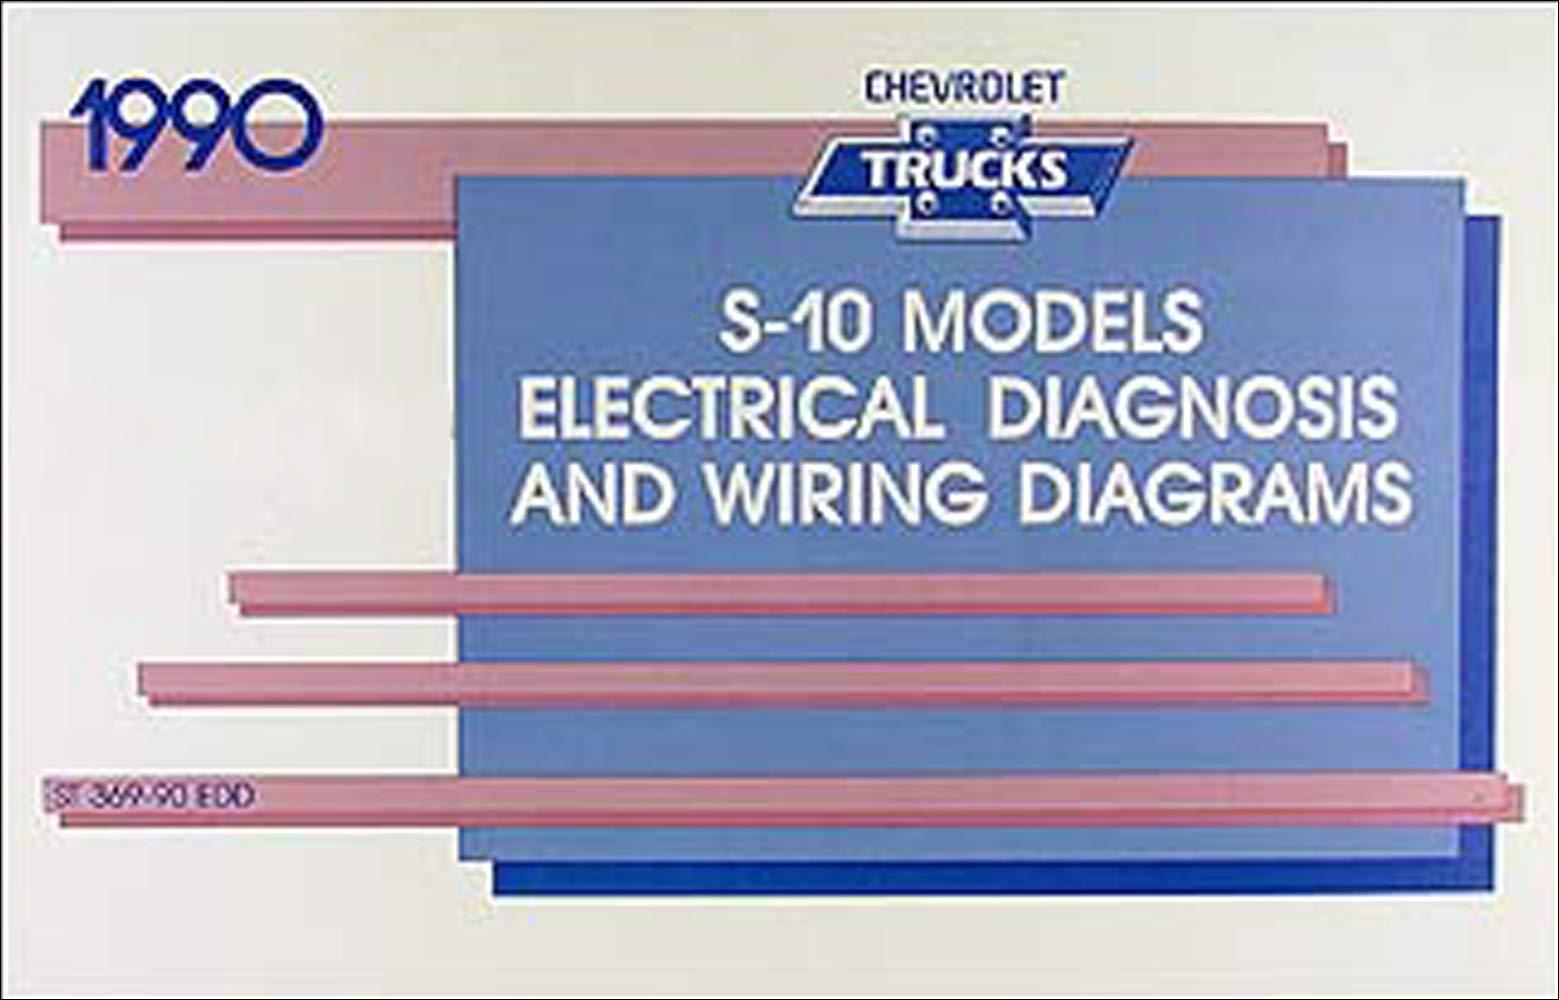 [FPWZ_2684]  1990 Chevy S-10 Pickup & Blazer Wiring Diagram Manual Original: Chevrolet:  Amazon.com: Books | 1990 Silverado Wiring Diagram |  | Amazon.com